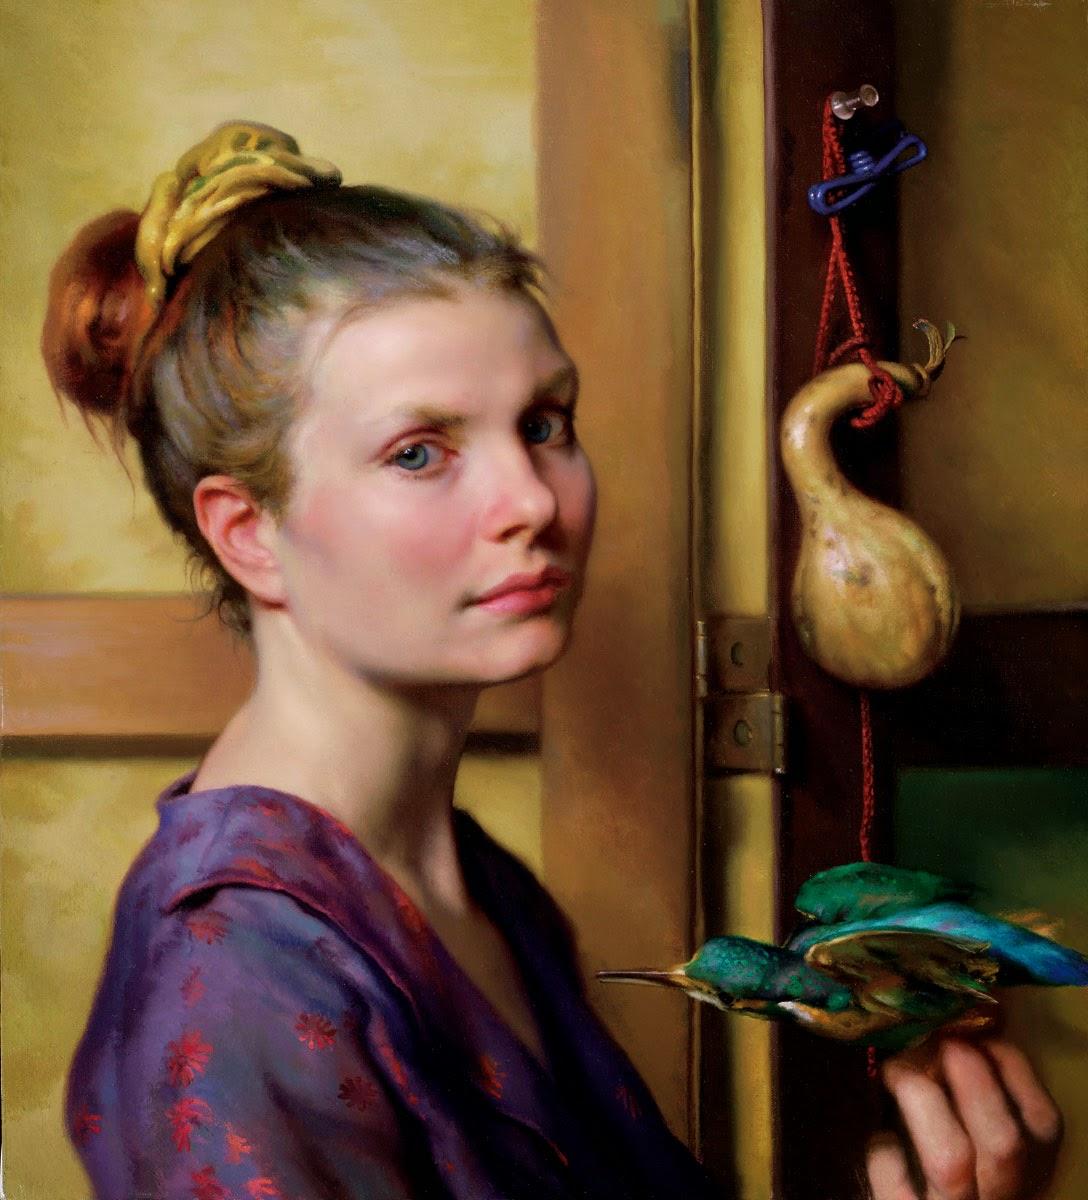 Por Amor al Arte: Nelson Shanks, pintor de renombre